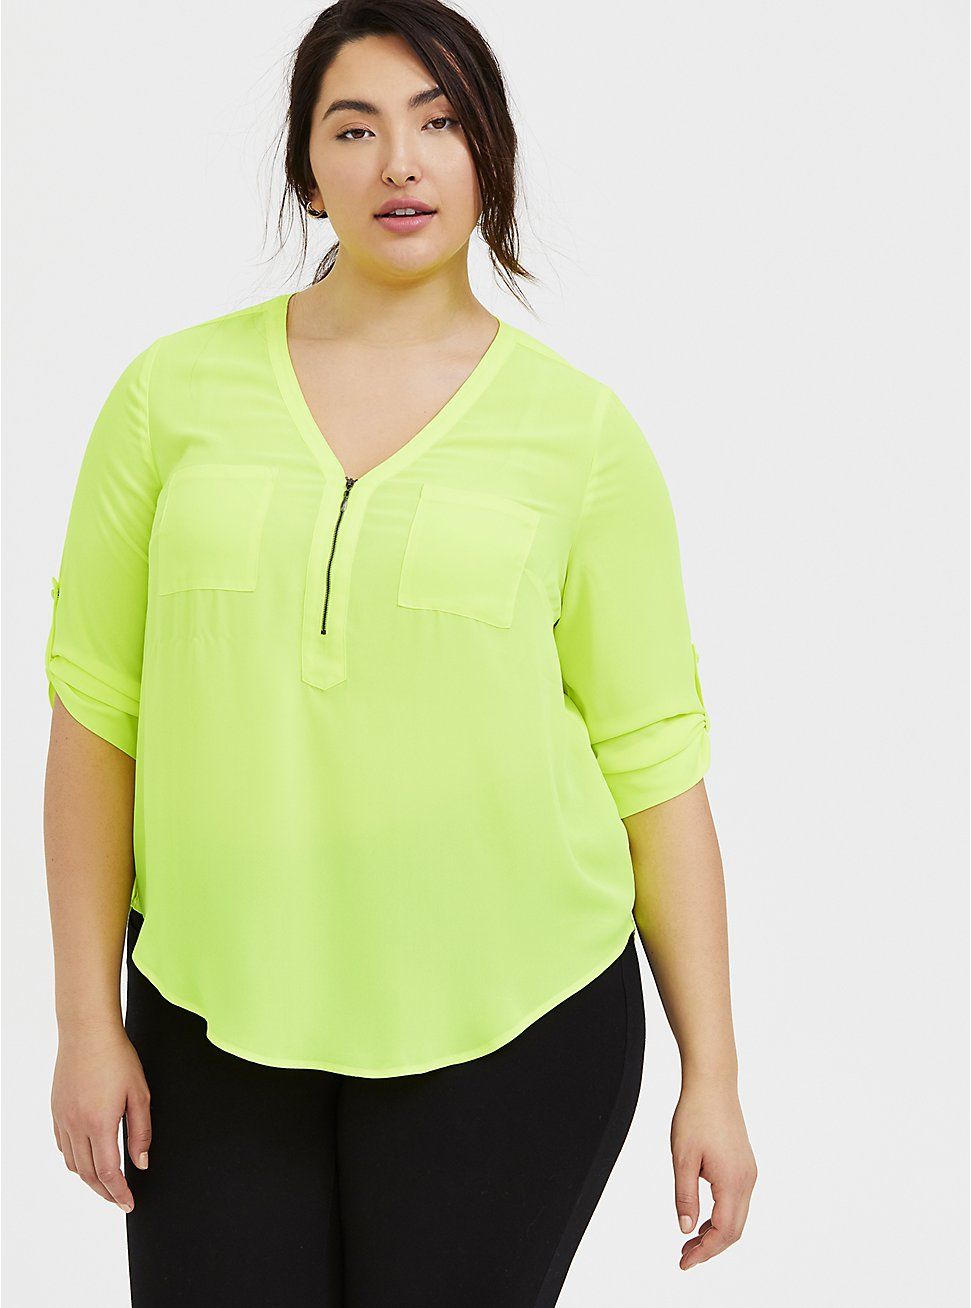 Harper - Neon Yellow Georgette Half-Zip Front Blouse, SAFETY YELLOW, hi-res